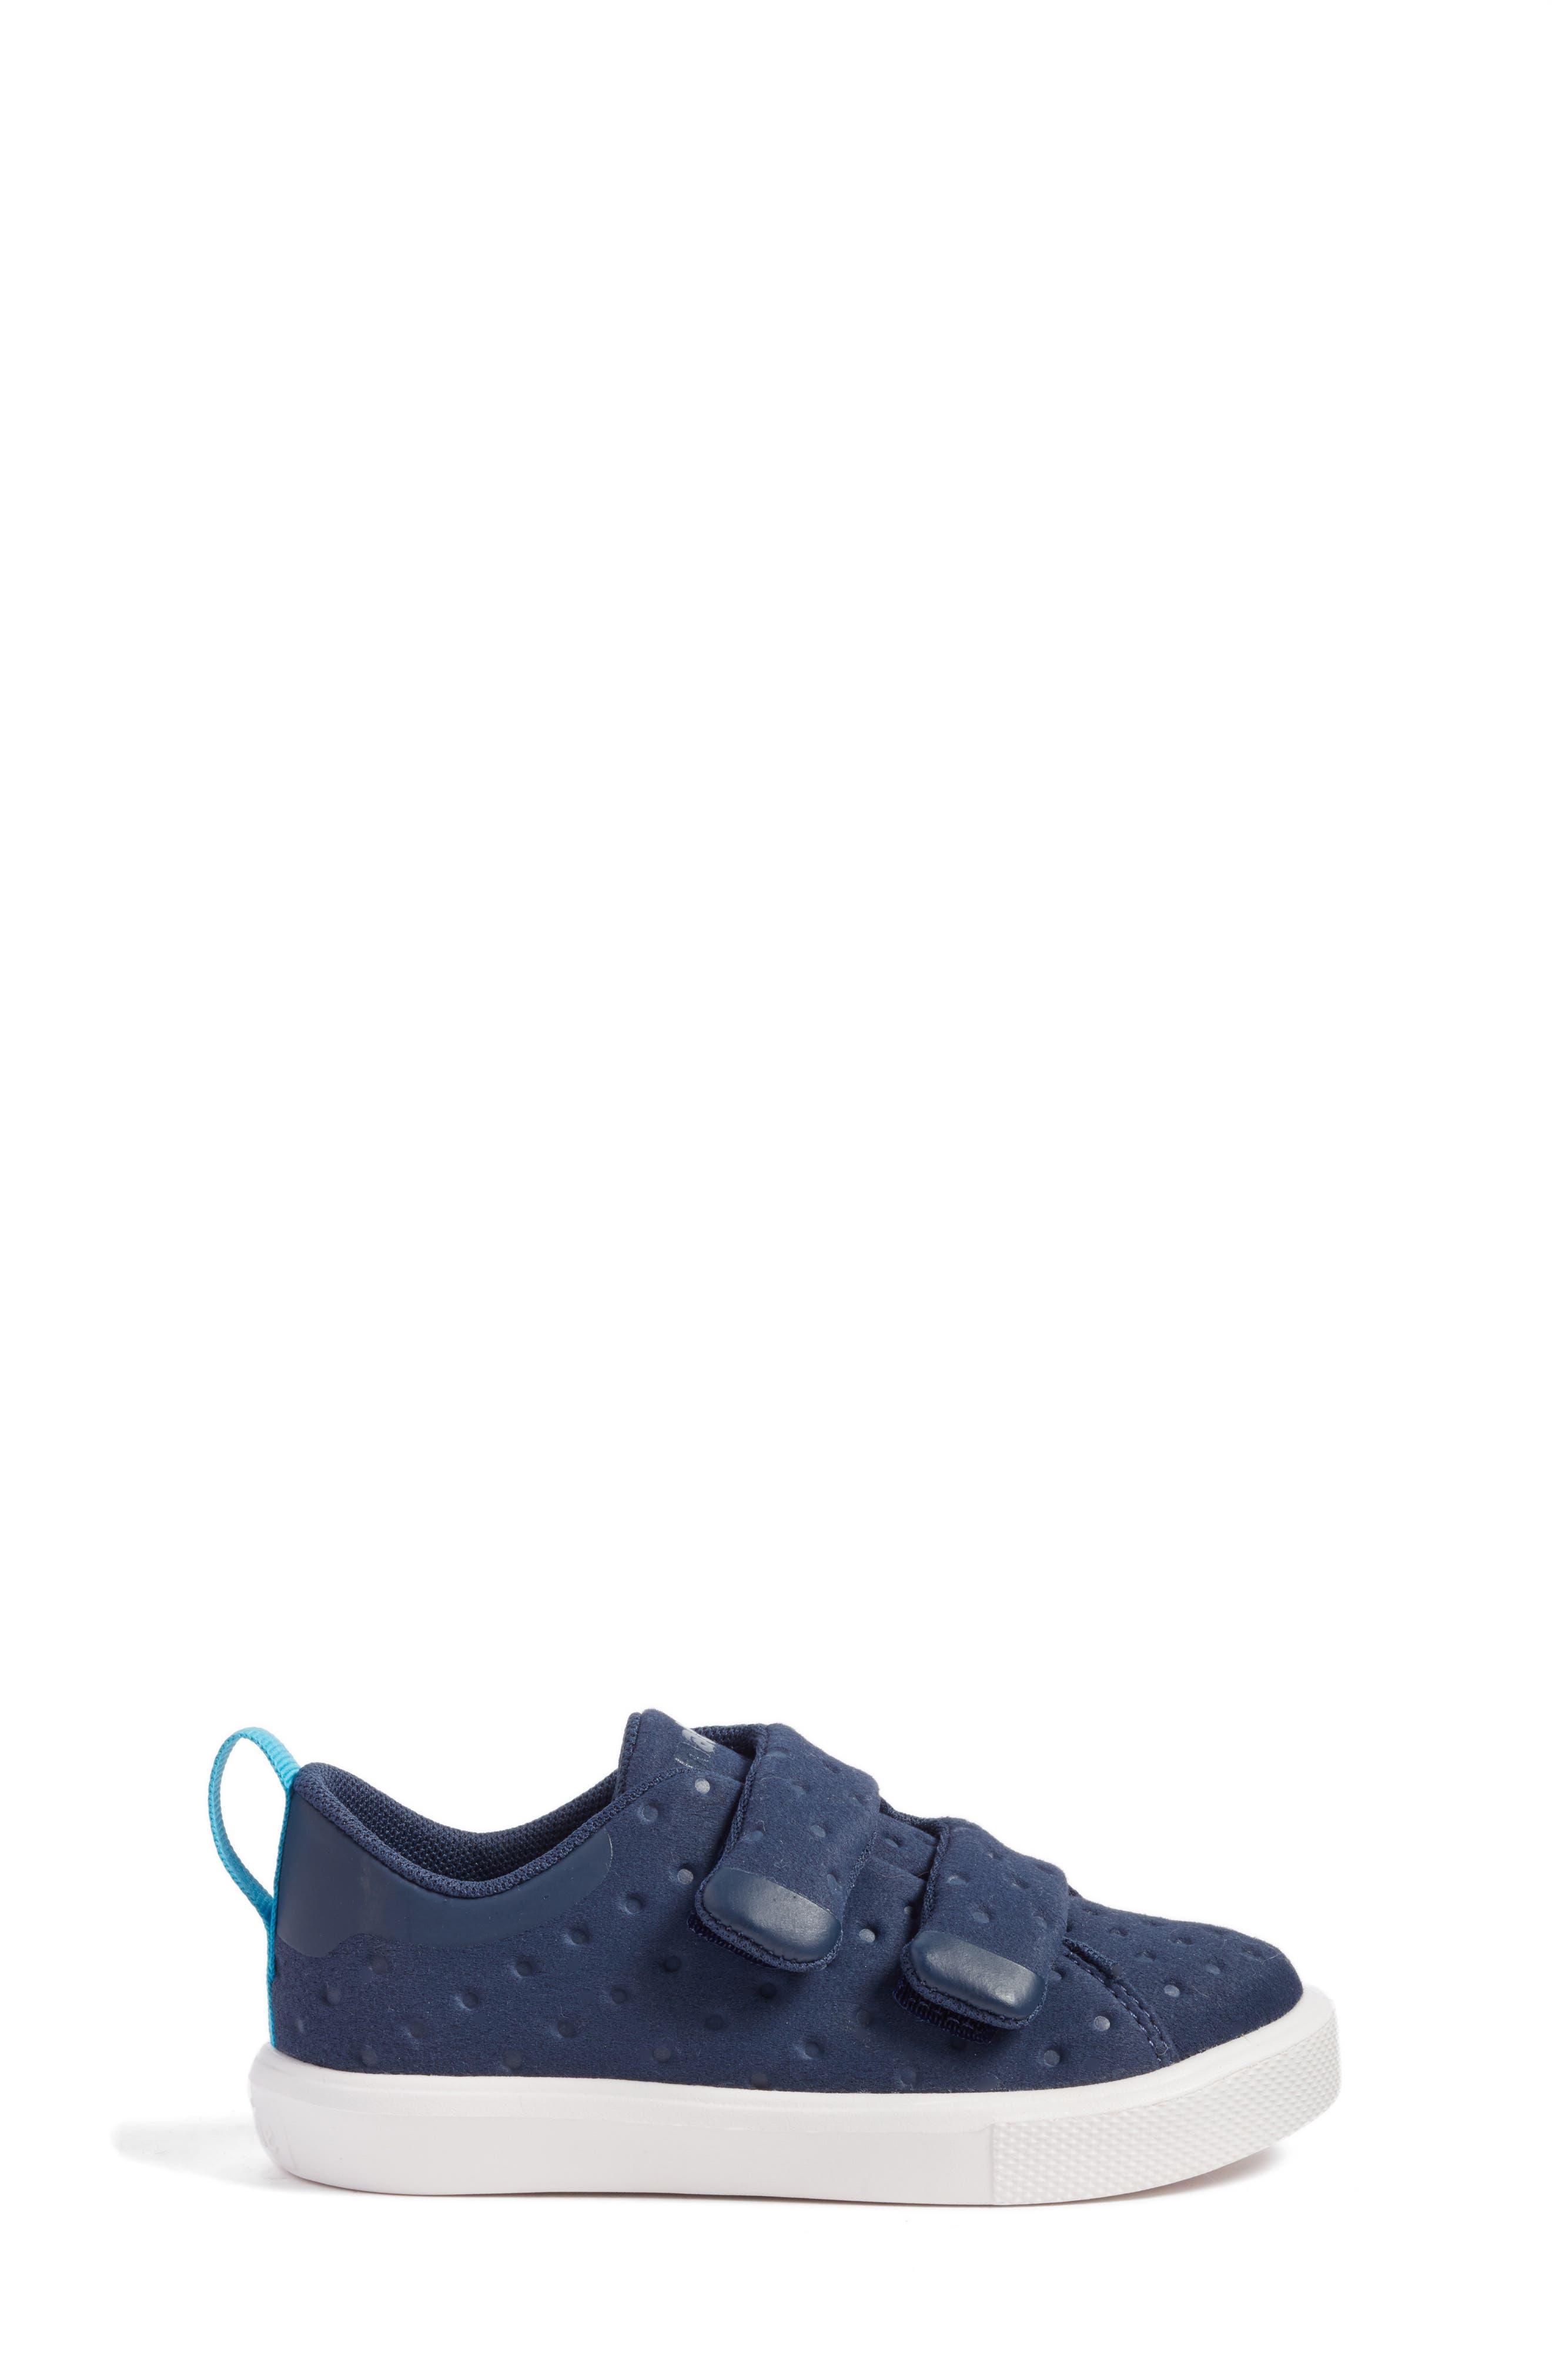 Alternate Image 3  - Native Shoes Monaco Sneaker (Walker, Toddler & Little Kid)